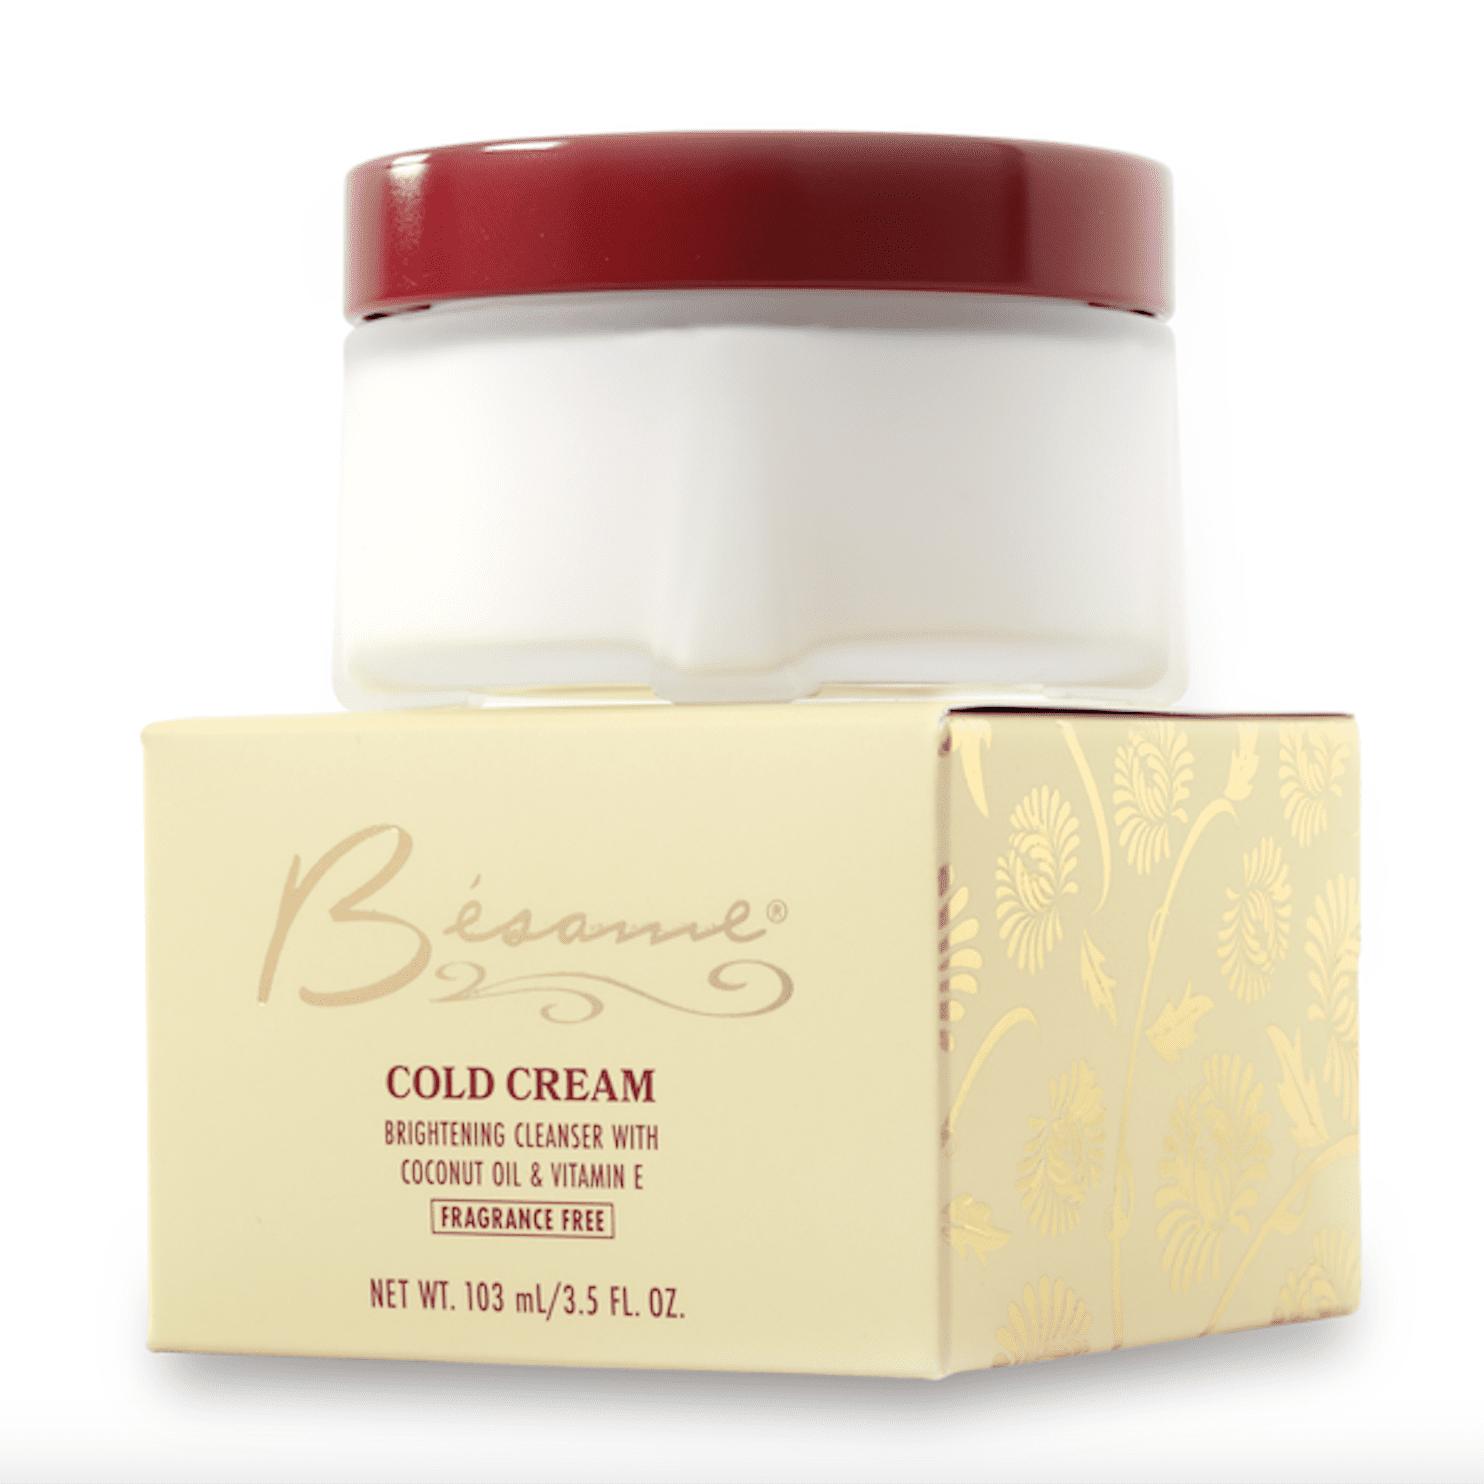 Bésame Cosmetics Cold Cream